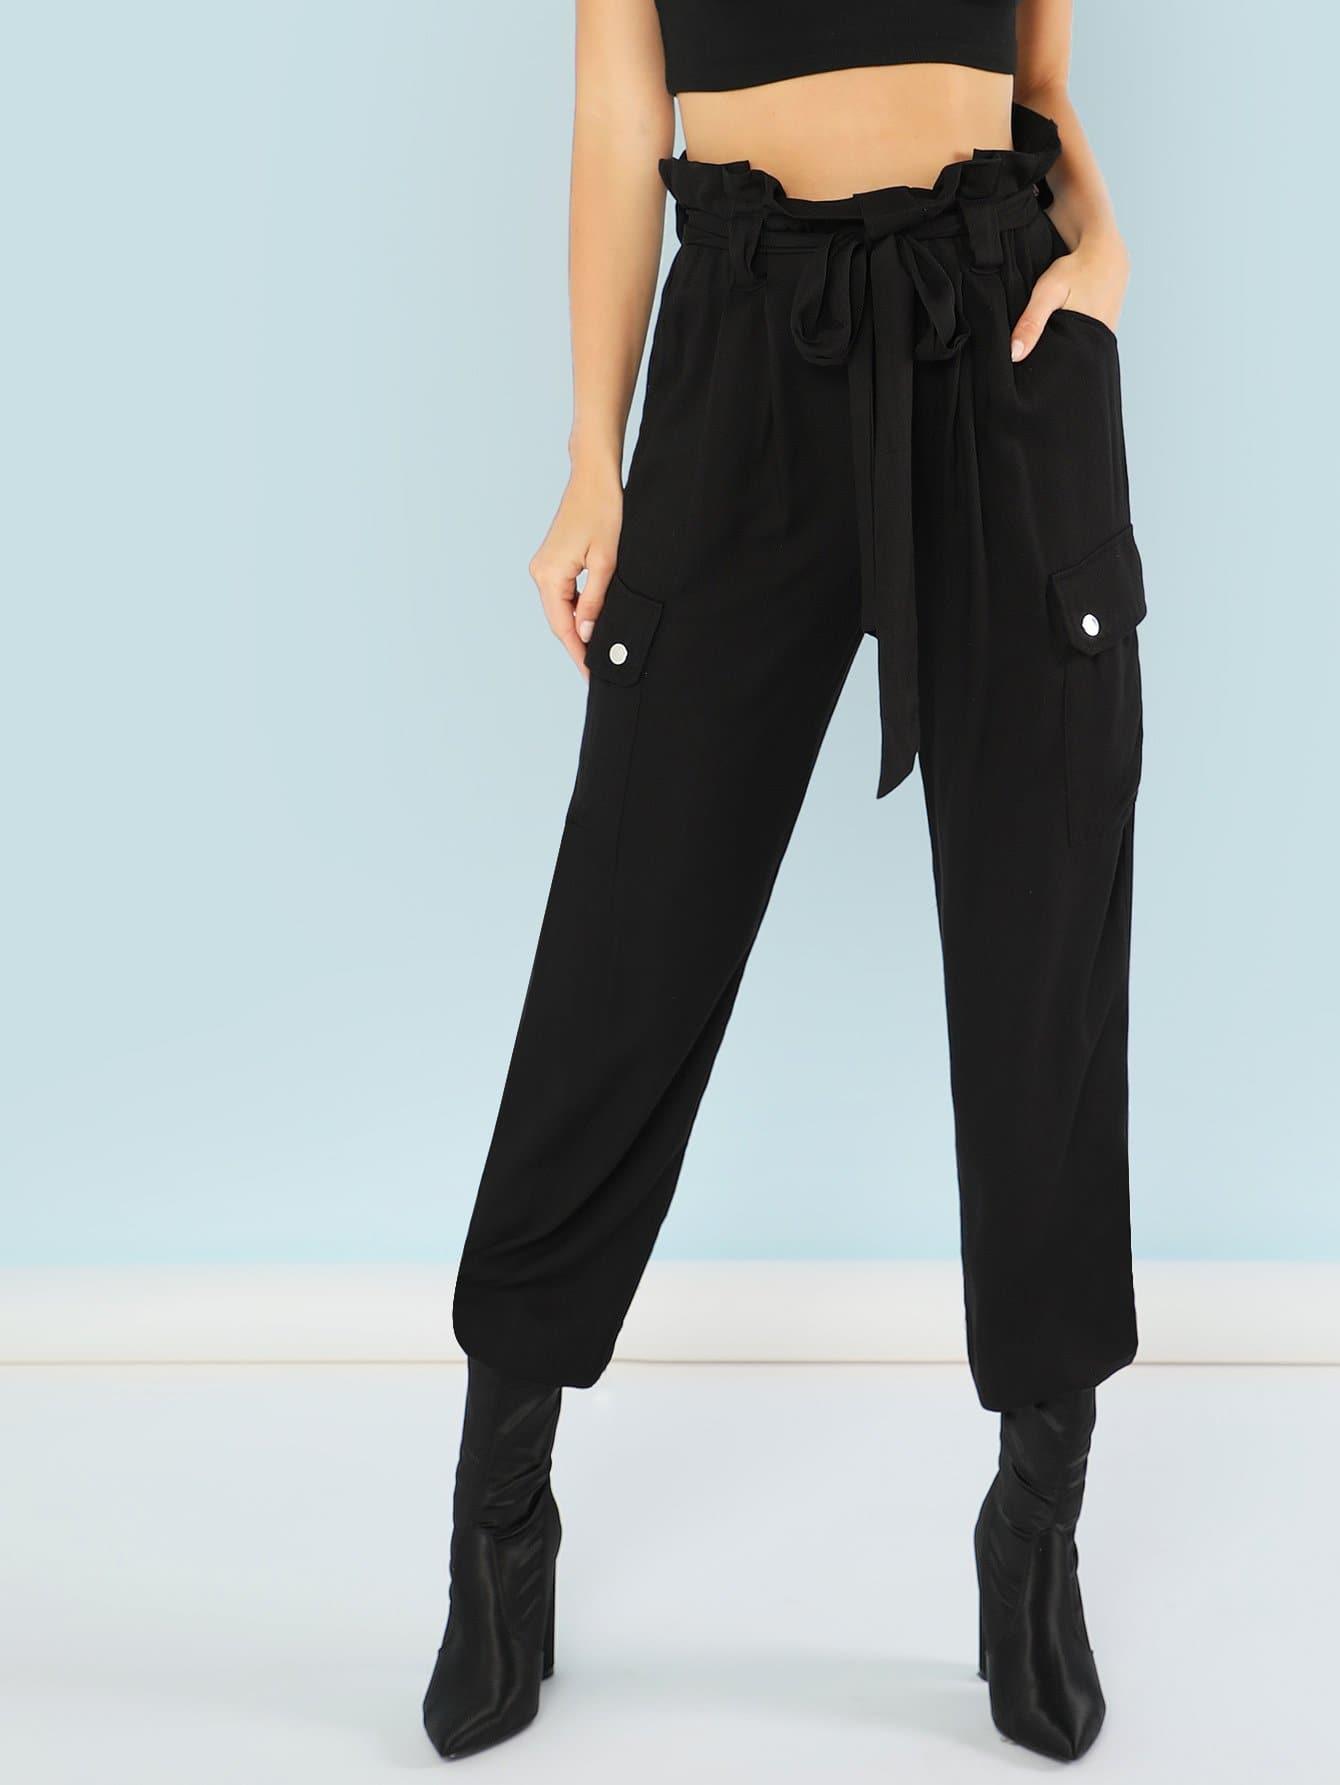 Frill Waist Pocket Patched Pants high waist pocket patched dot skirt